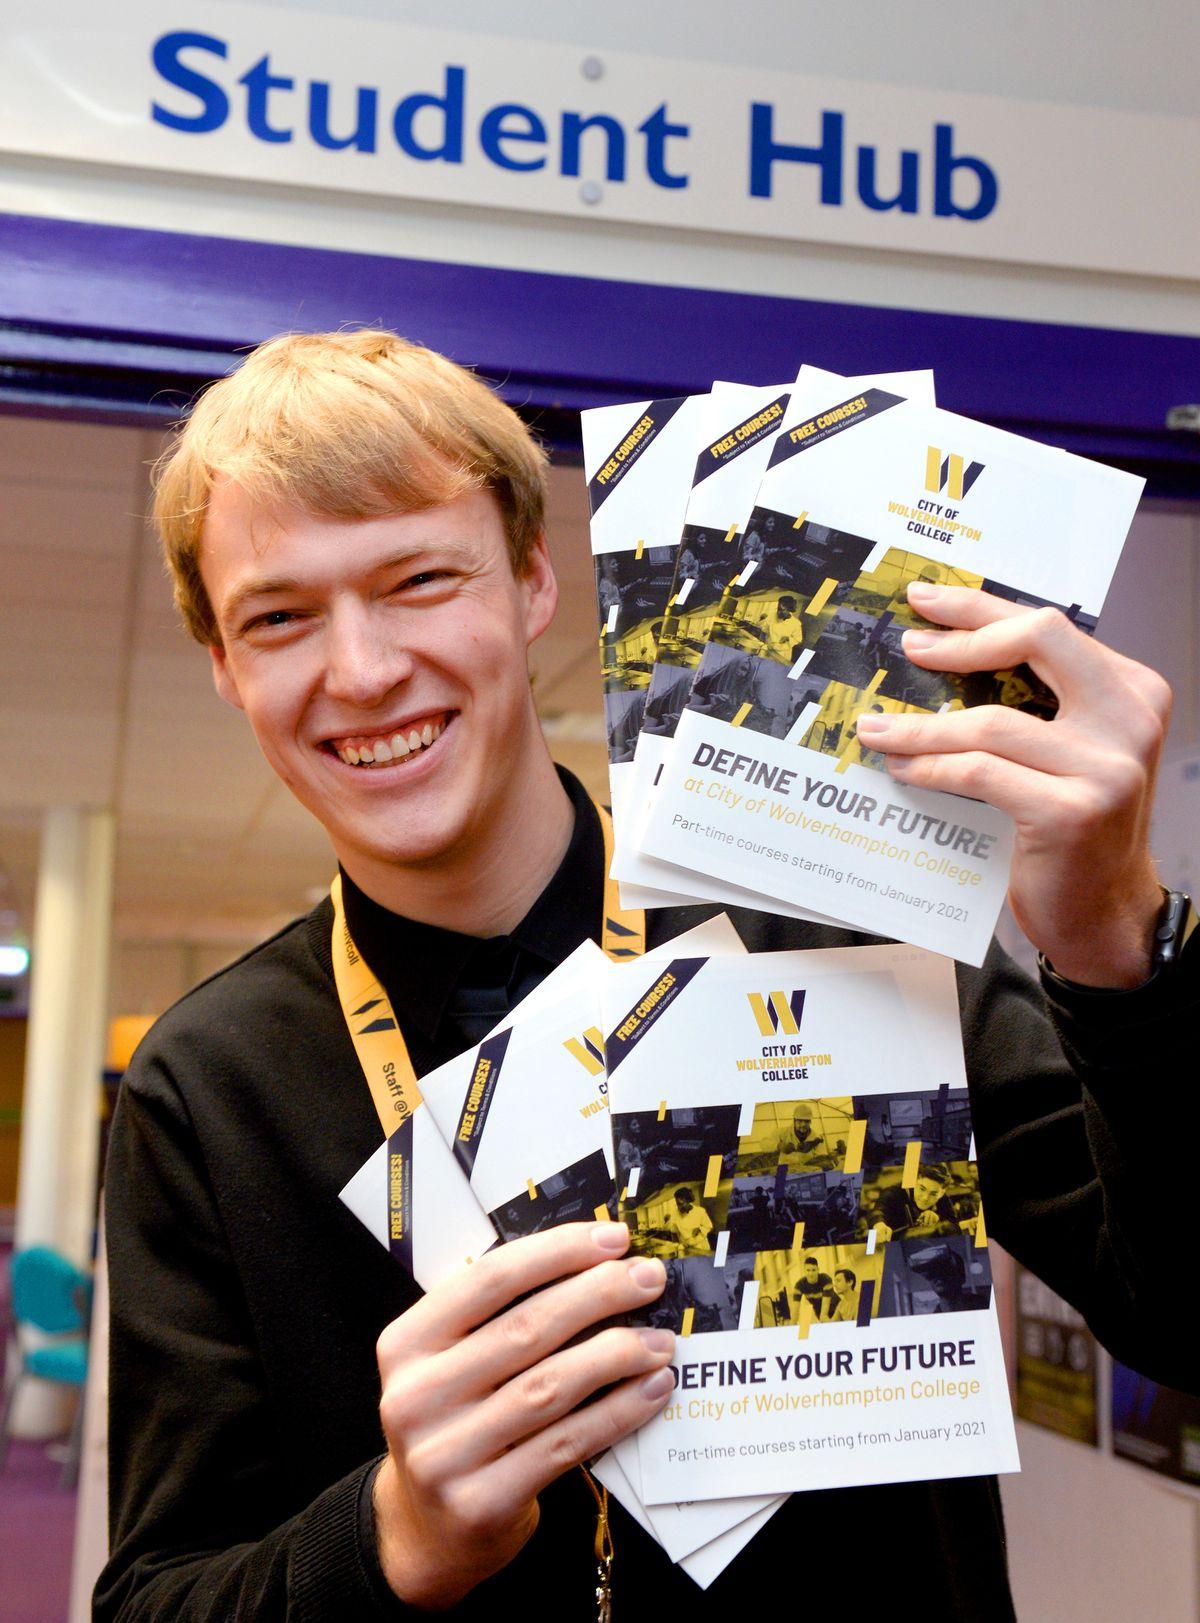 Bradley Hughes, aged 21